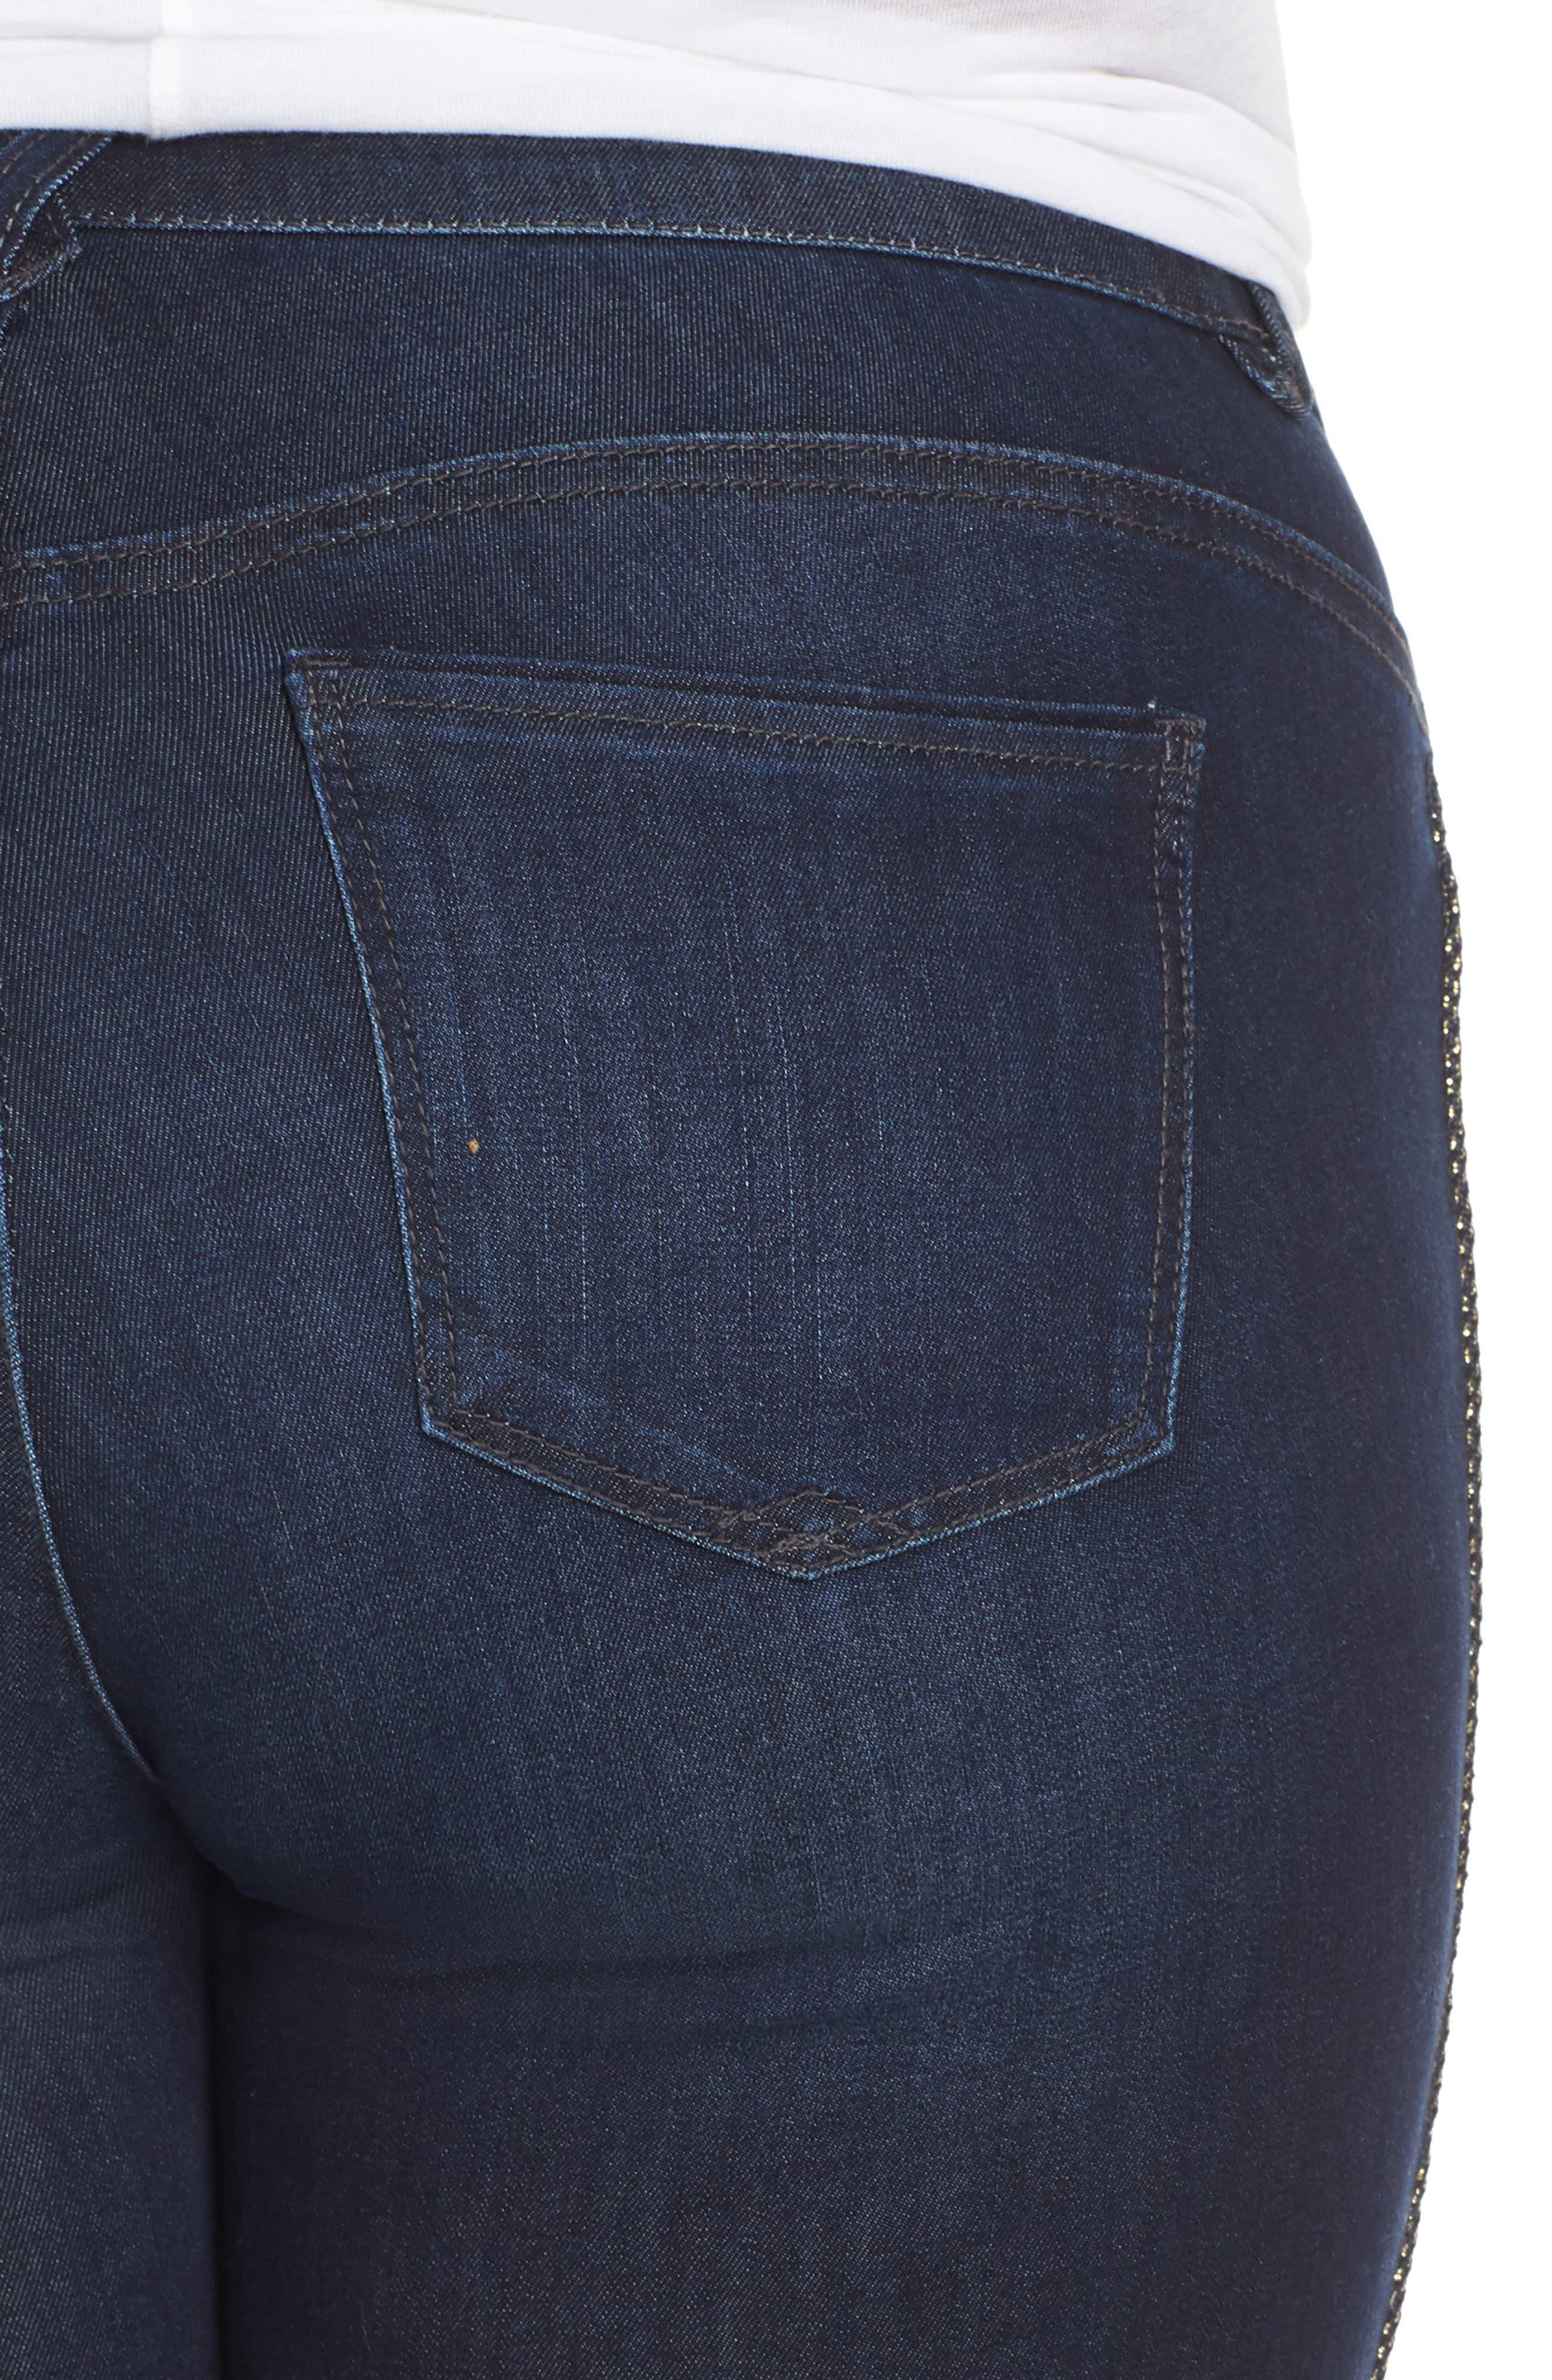 Ab-Solution Side Trim Ankle Jeans,                             Alternate thumbnail 4, color,                             INDIGO